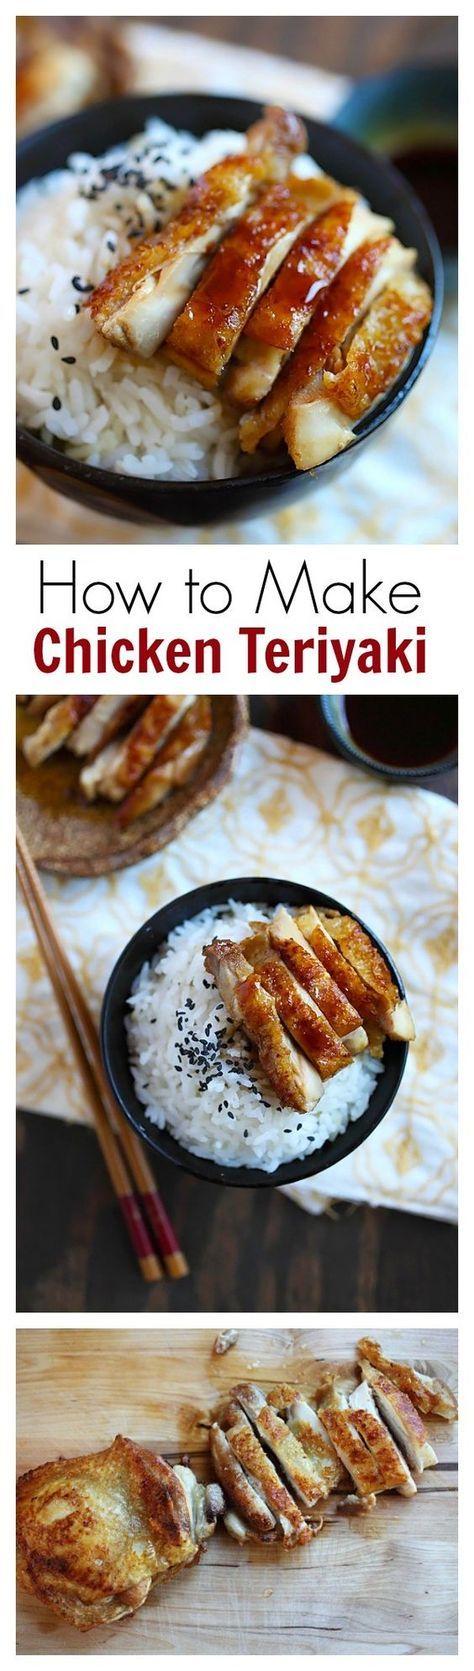 Get the recipe ♥ Chicken Teriyaki @recipes_to_go